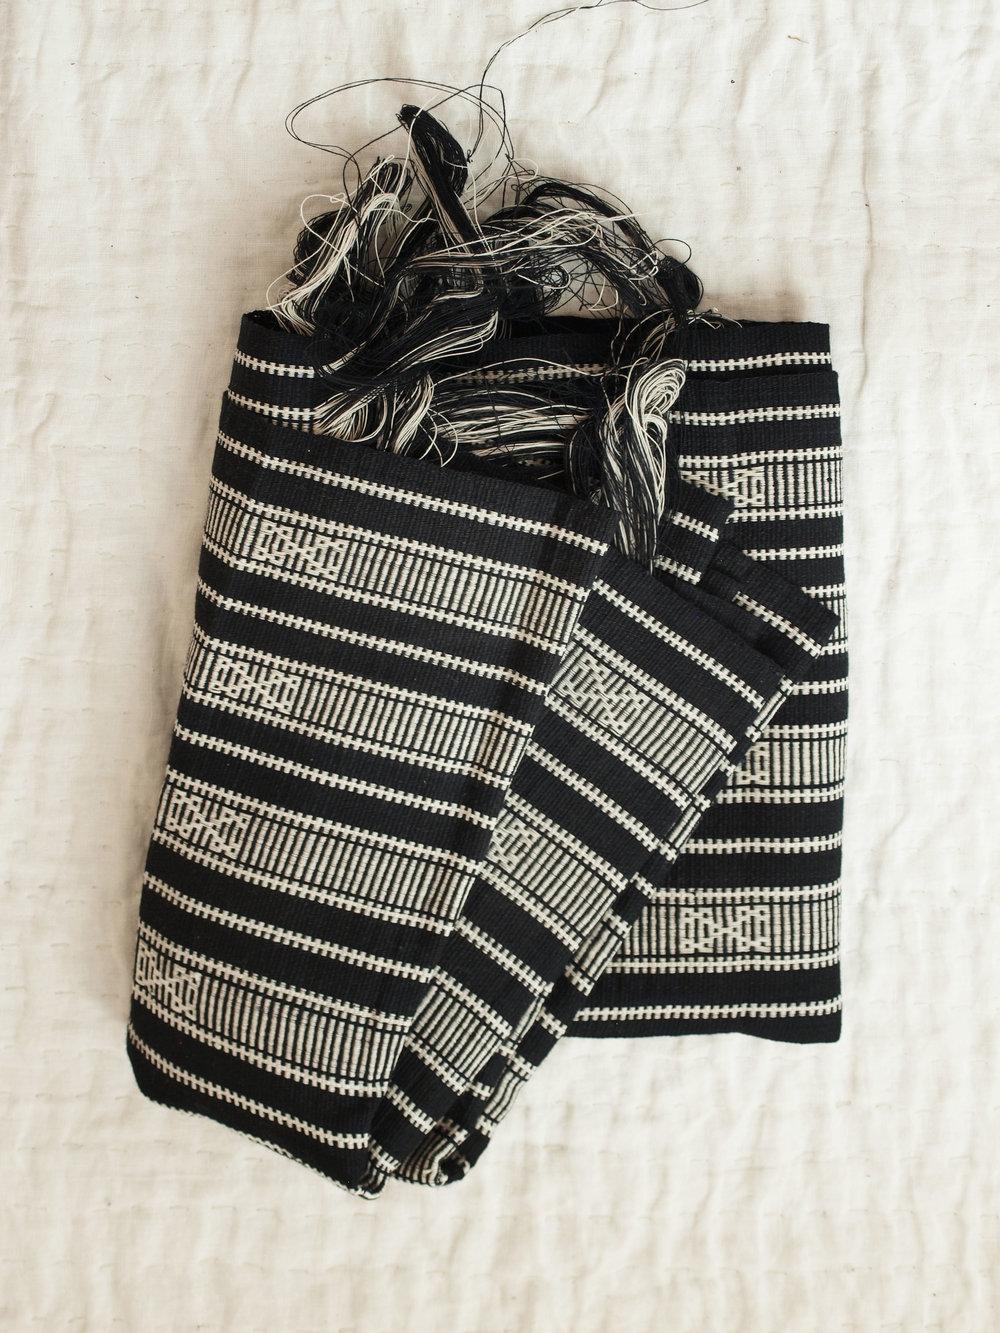 handa_textiles - 3.jpg